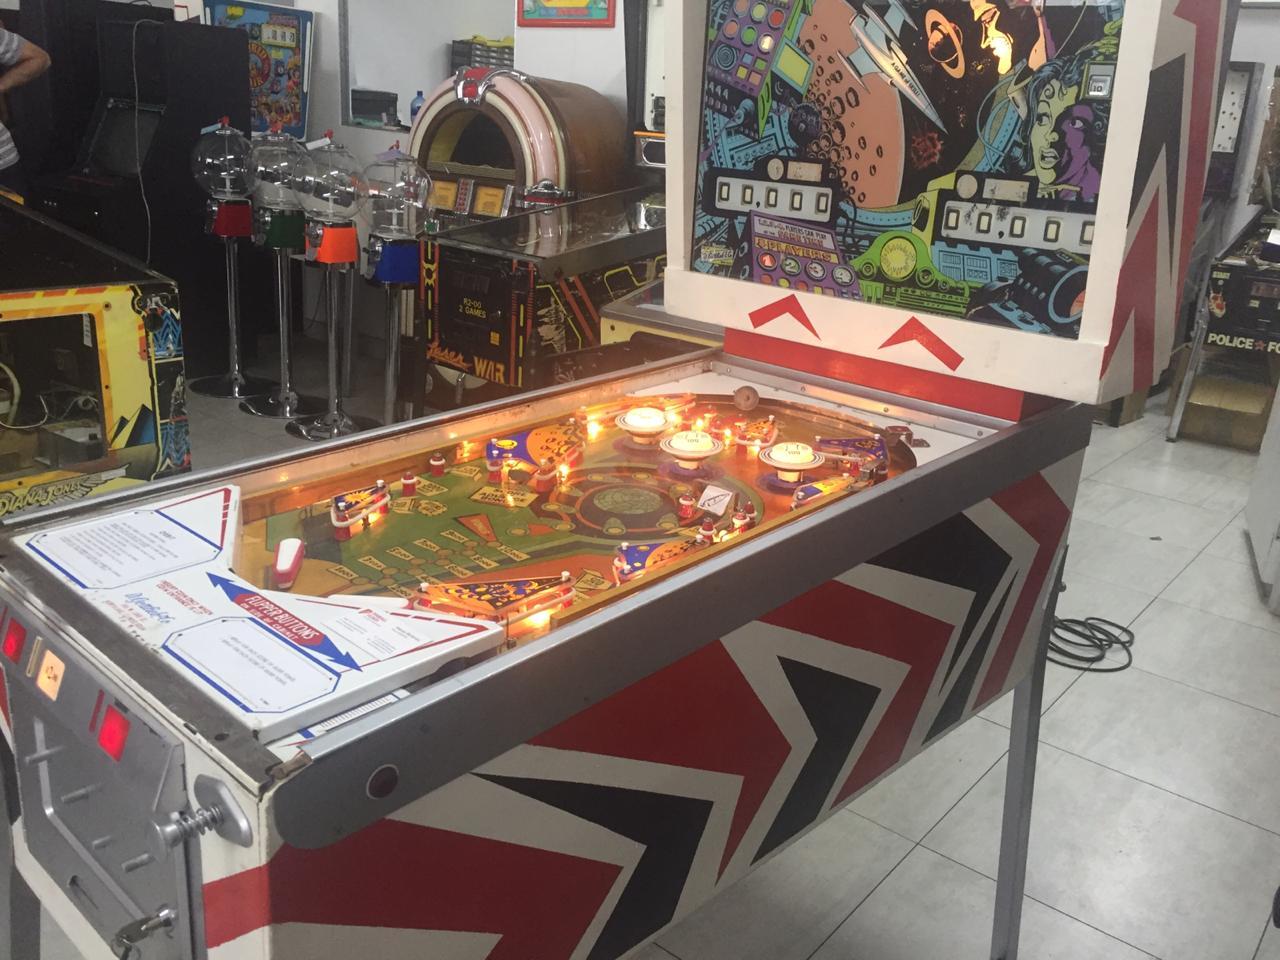 Orbit Pinball Machine, a 4 player pinball machine manufactured by Gottlieb for sale